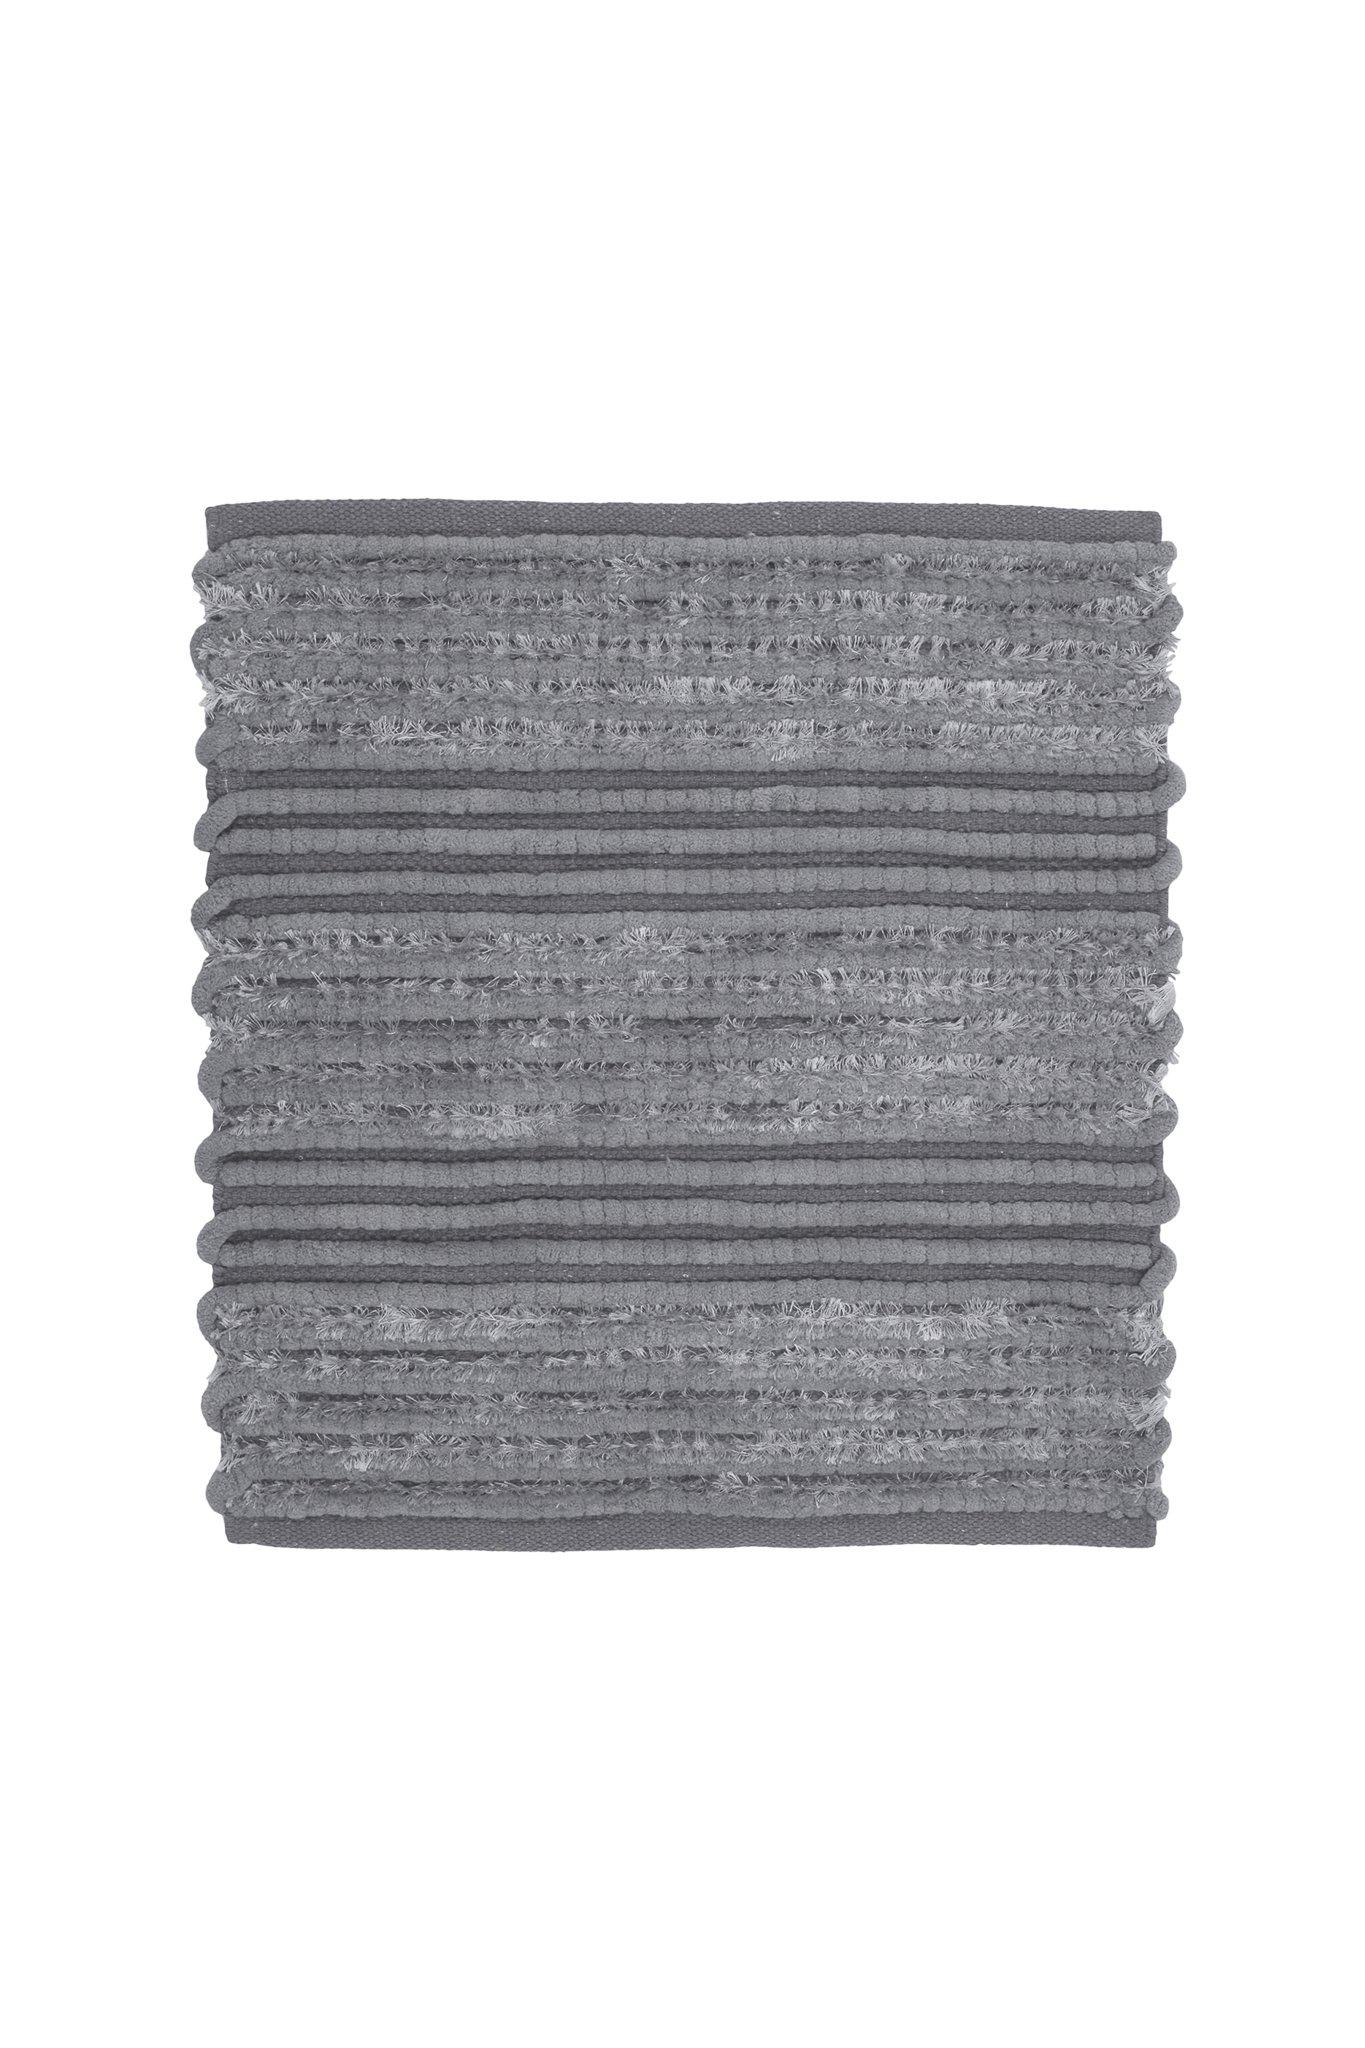 Solange Badematte 60x60 Antracite